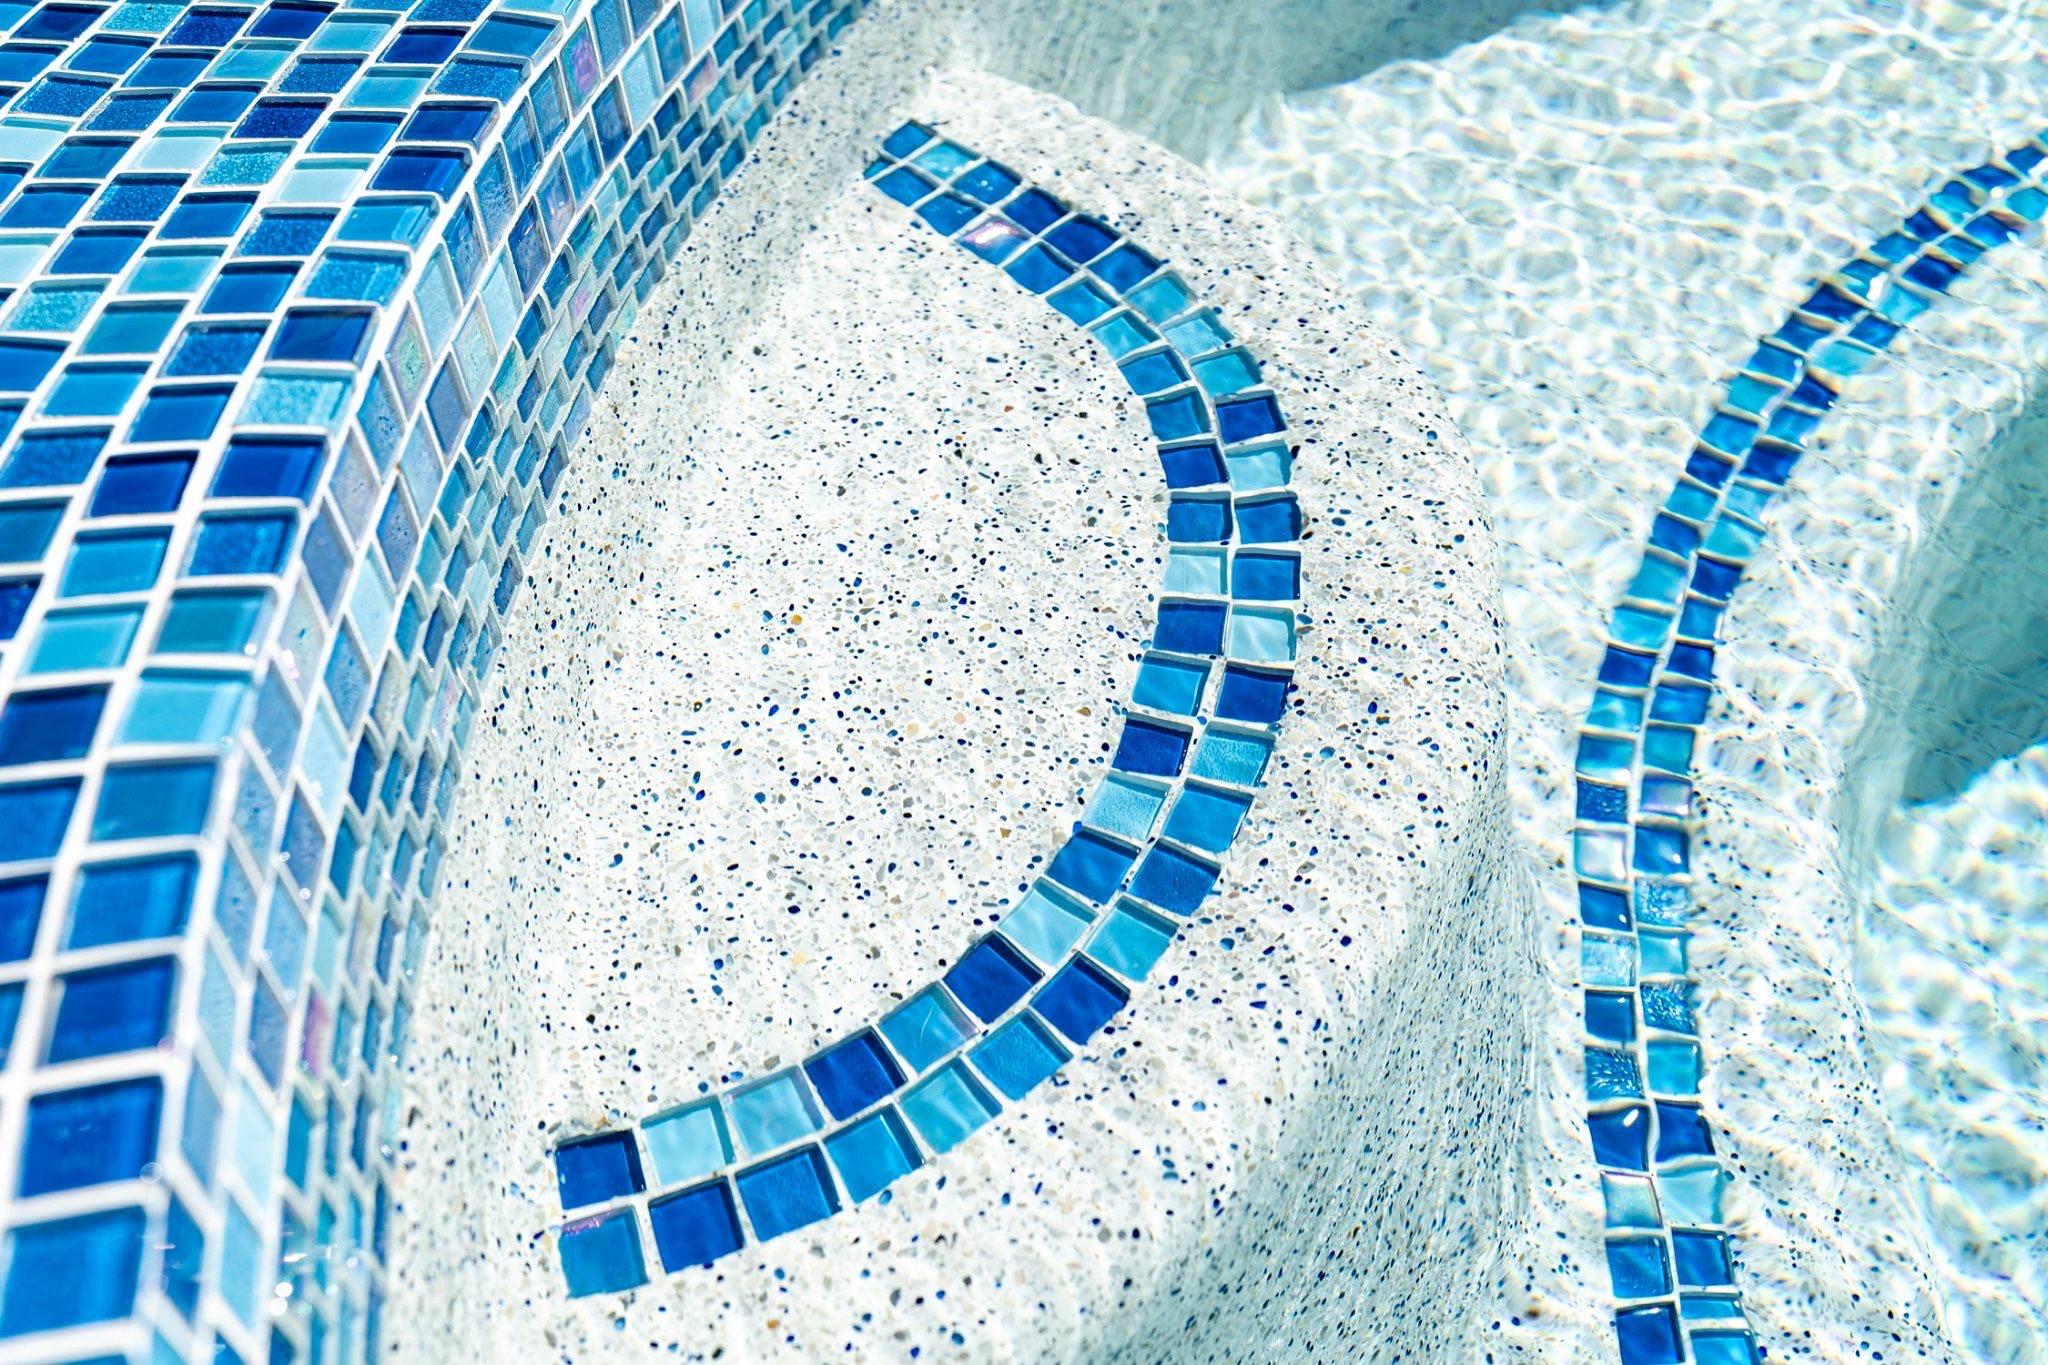 Pool Kings of Palm Beach reviews | Pool Cleaners at 8930 Hidden Acres Drive - Boynton Beach FL